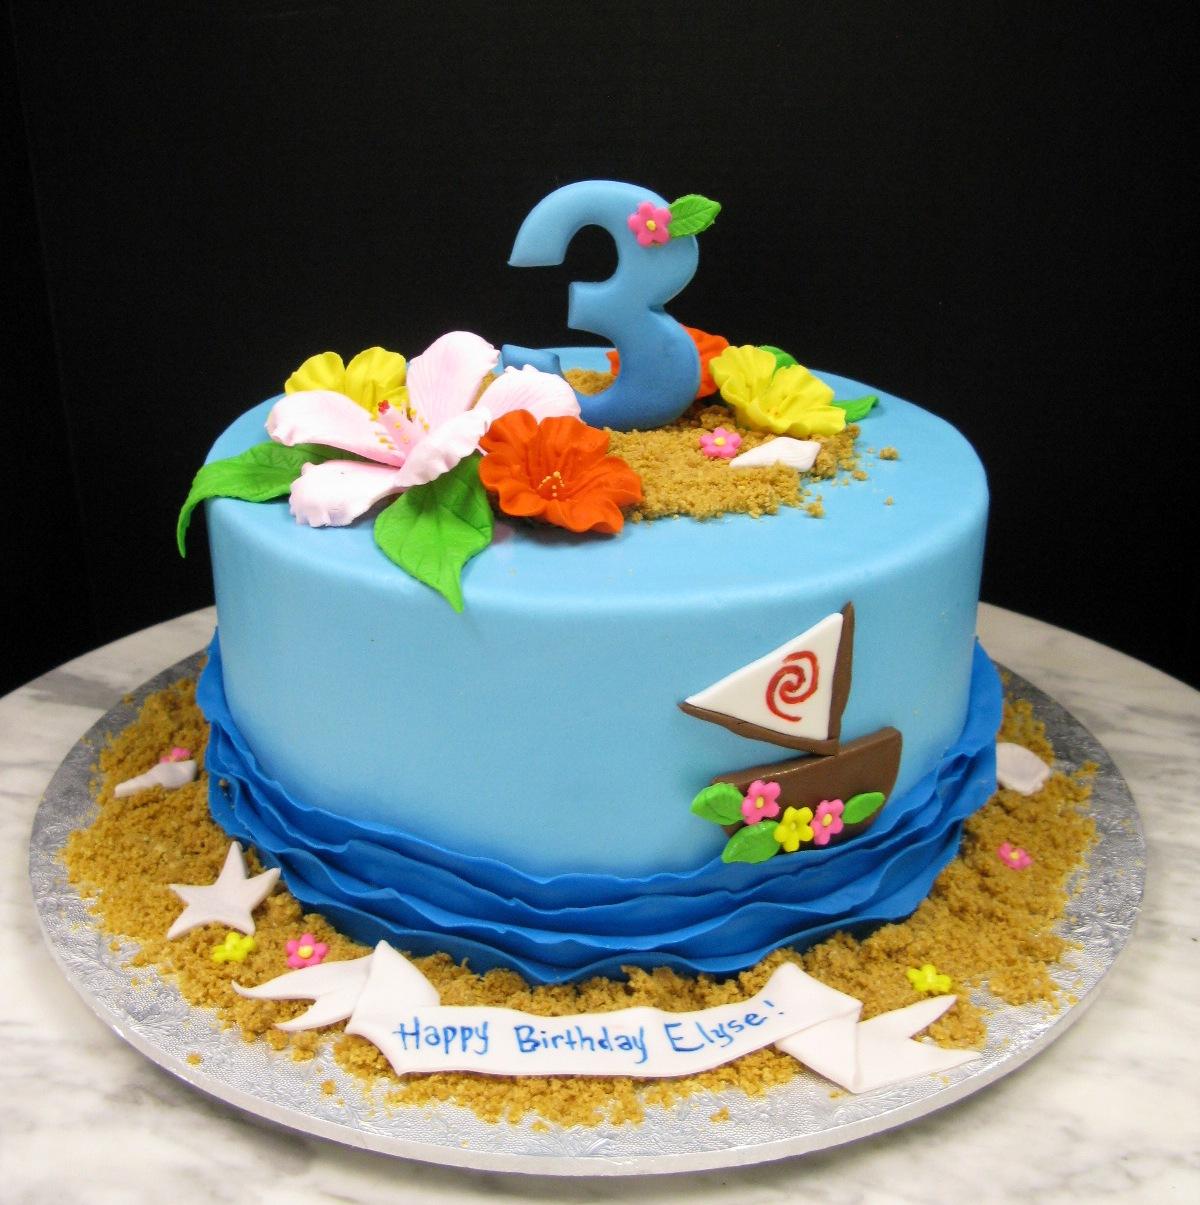 Moana-Inspired Cake